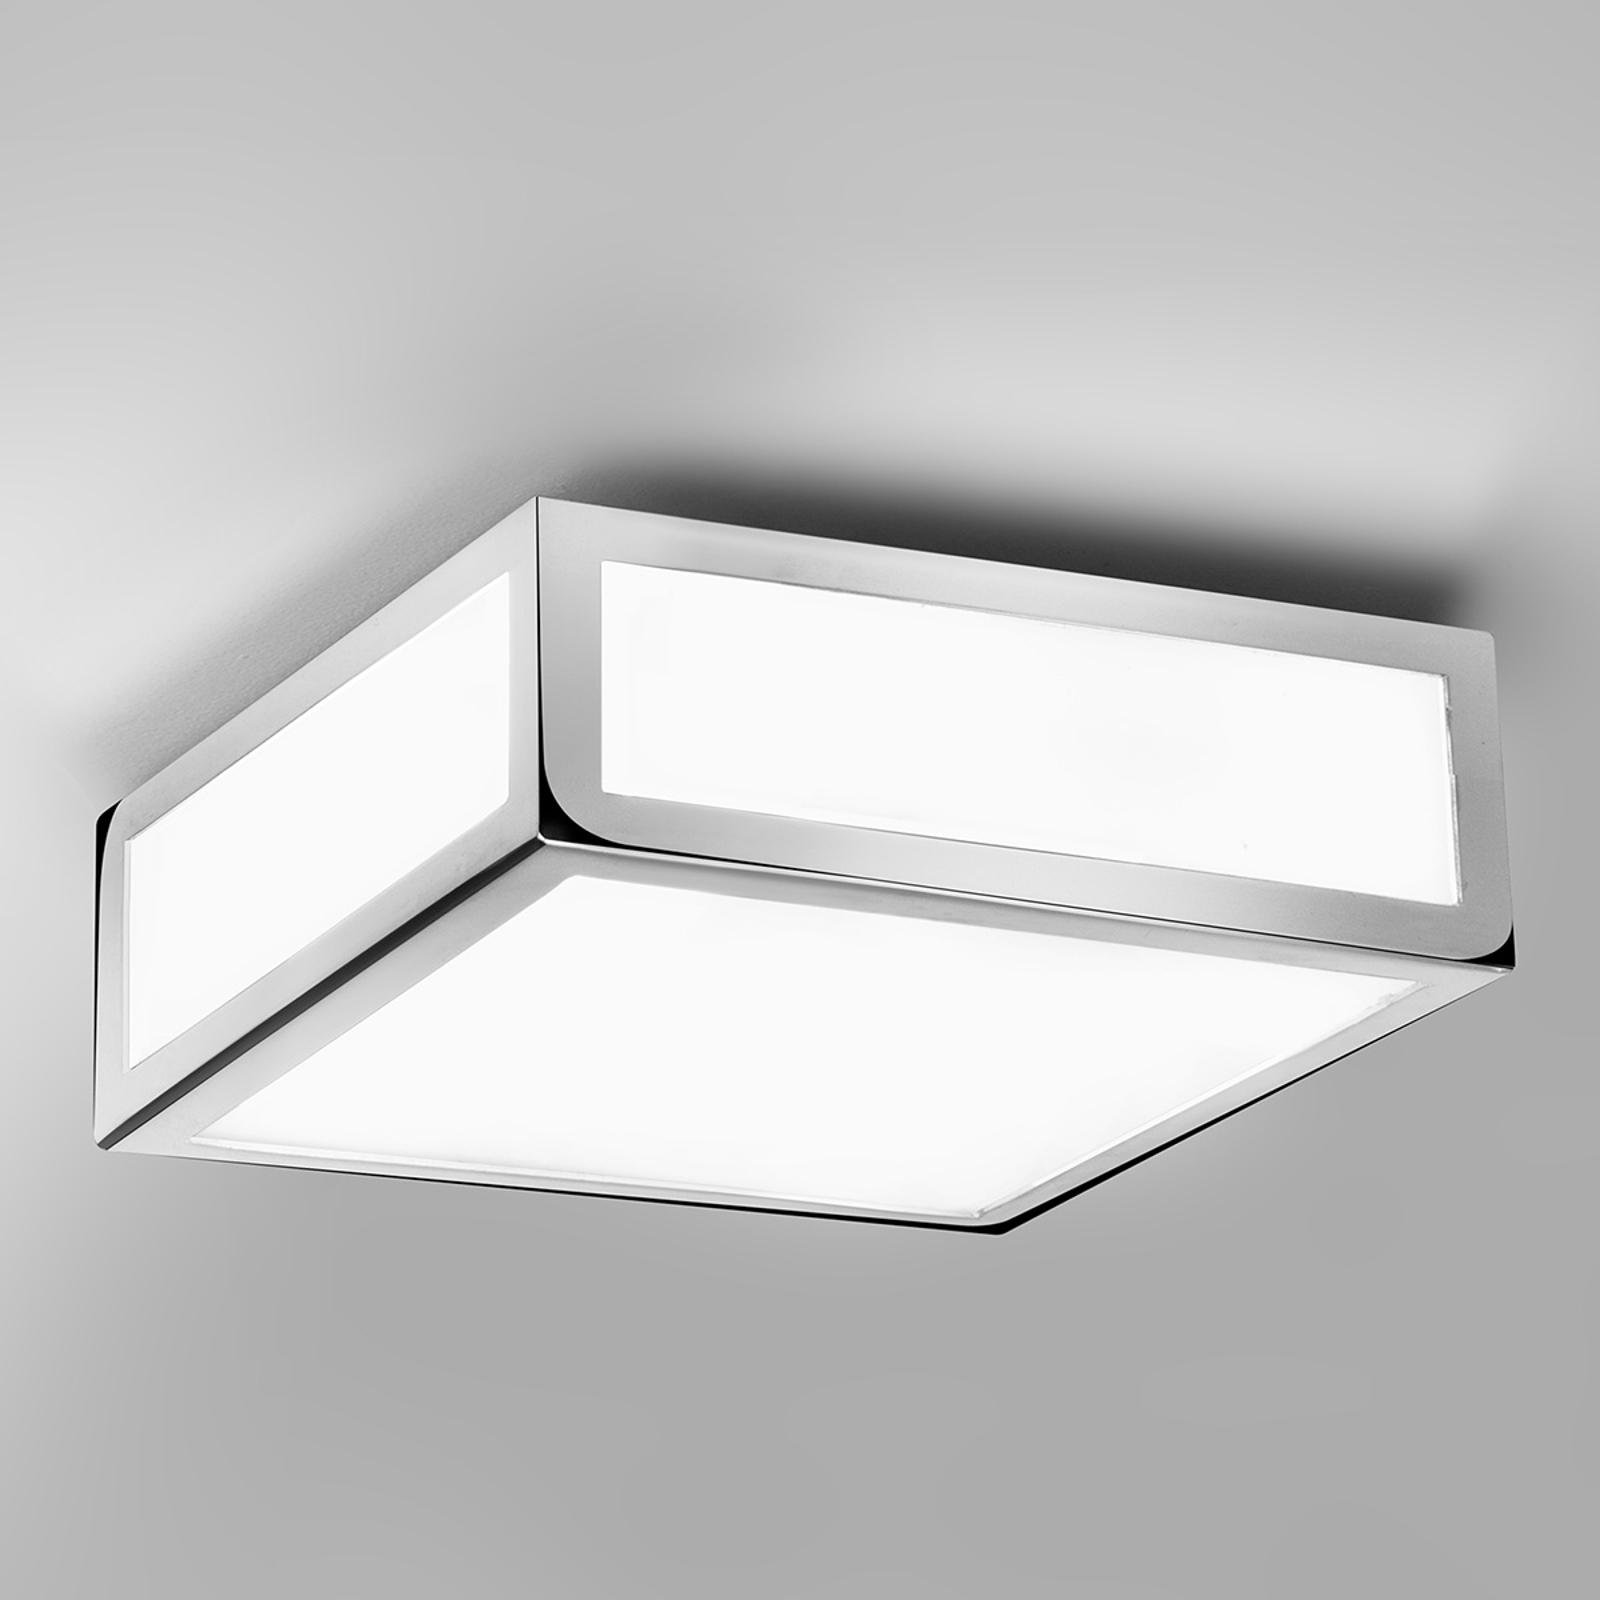 Decente plafondlamp Mashiko, 20 x 20 cm